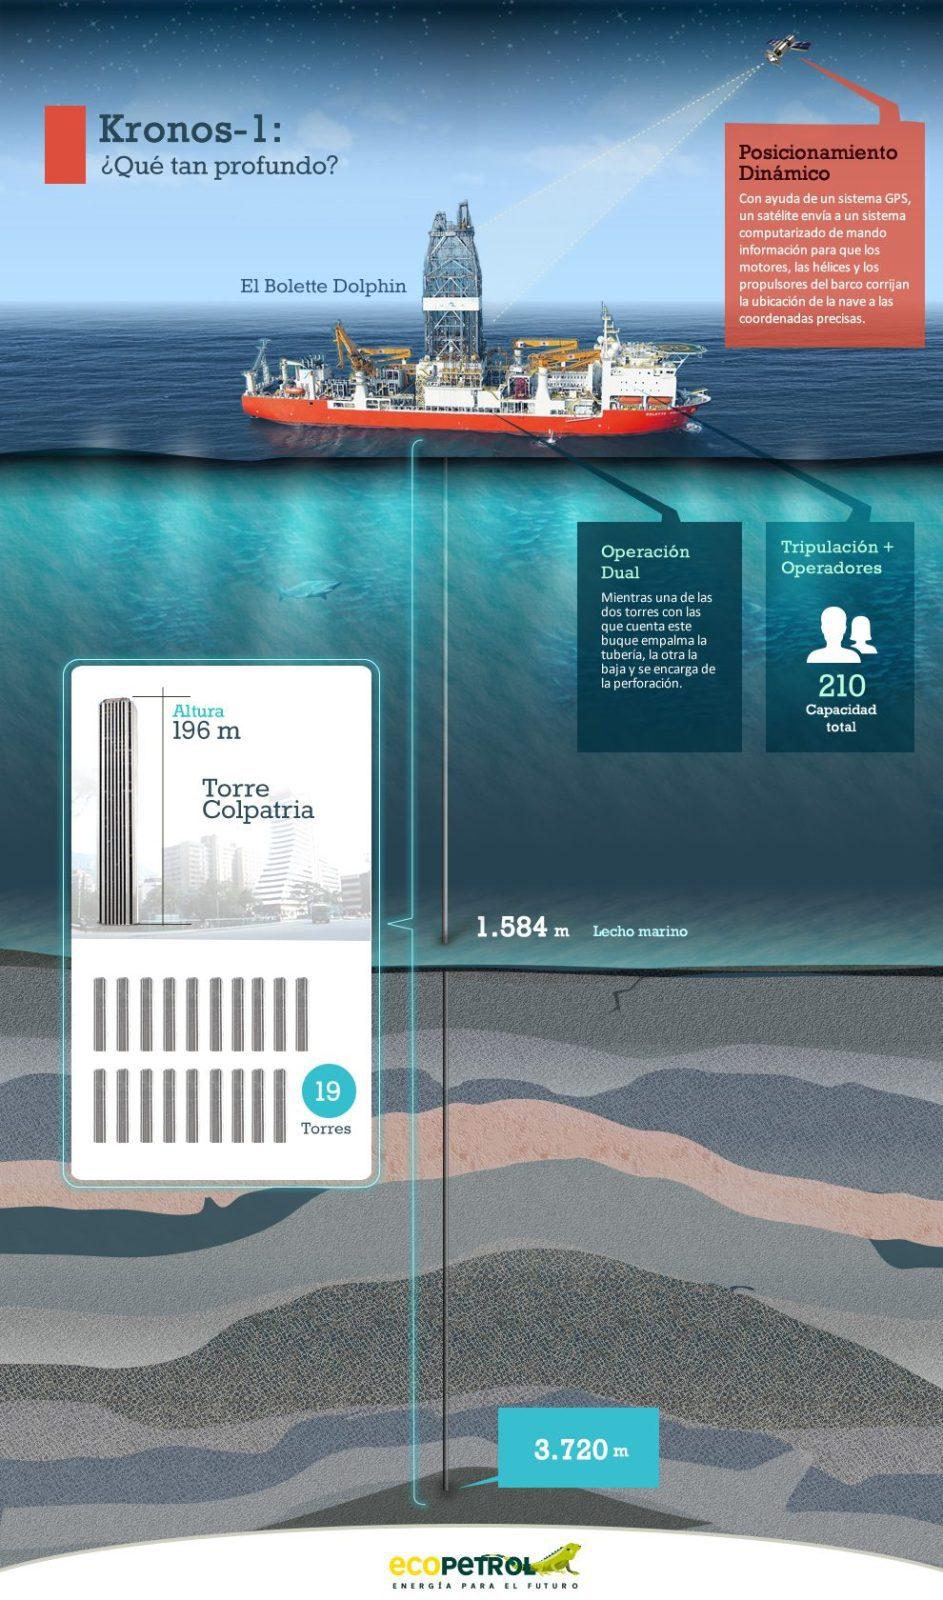 Ecopetrol & Anadarko Strike Oil Off Colombia's Atlantic Coast, Almost 4km Deep